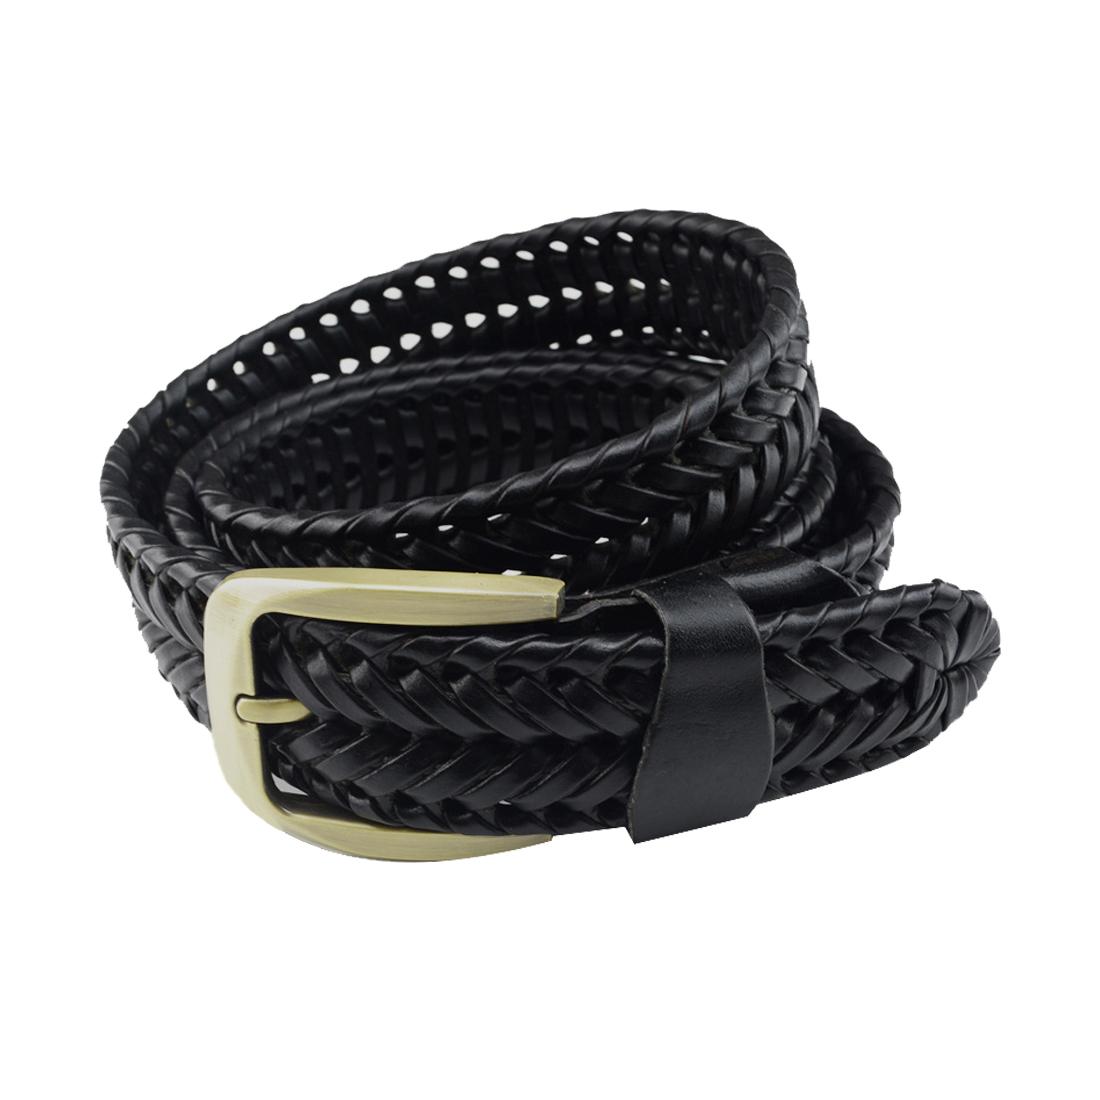 Unisex Hand Made Braided Alloy Pin Buckle Imitation Leather Belt Black